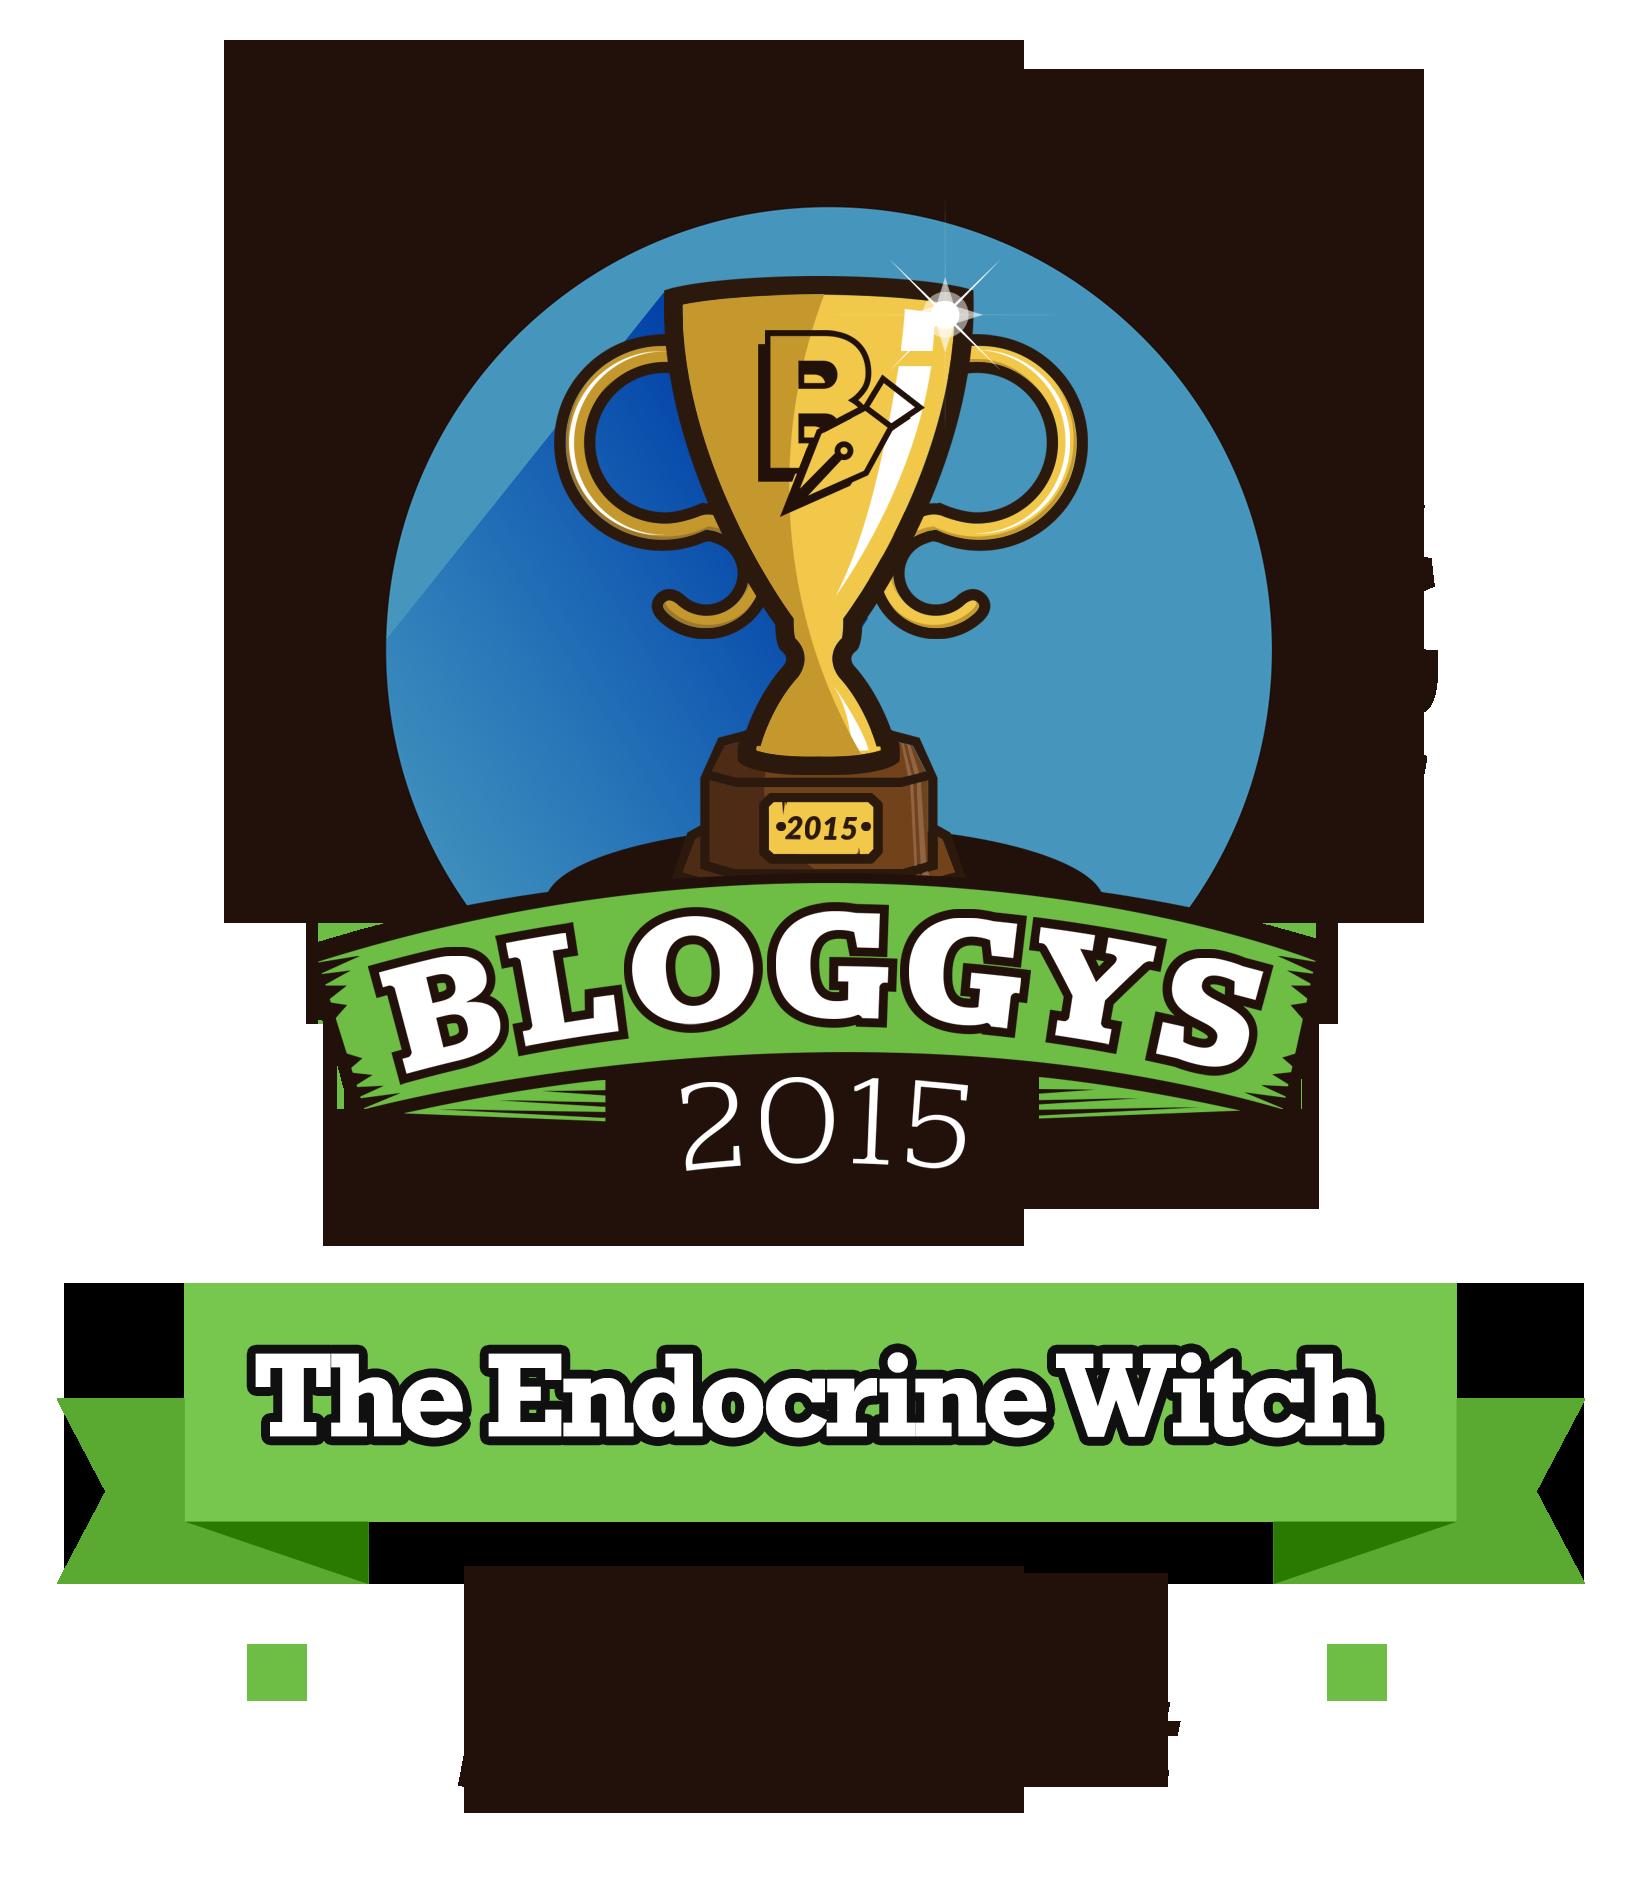 #bloggys2015BestBlogPost